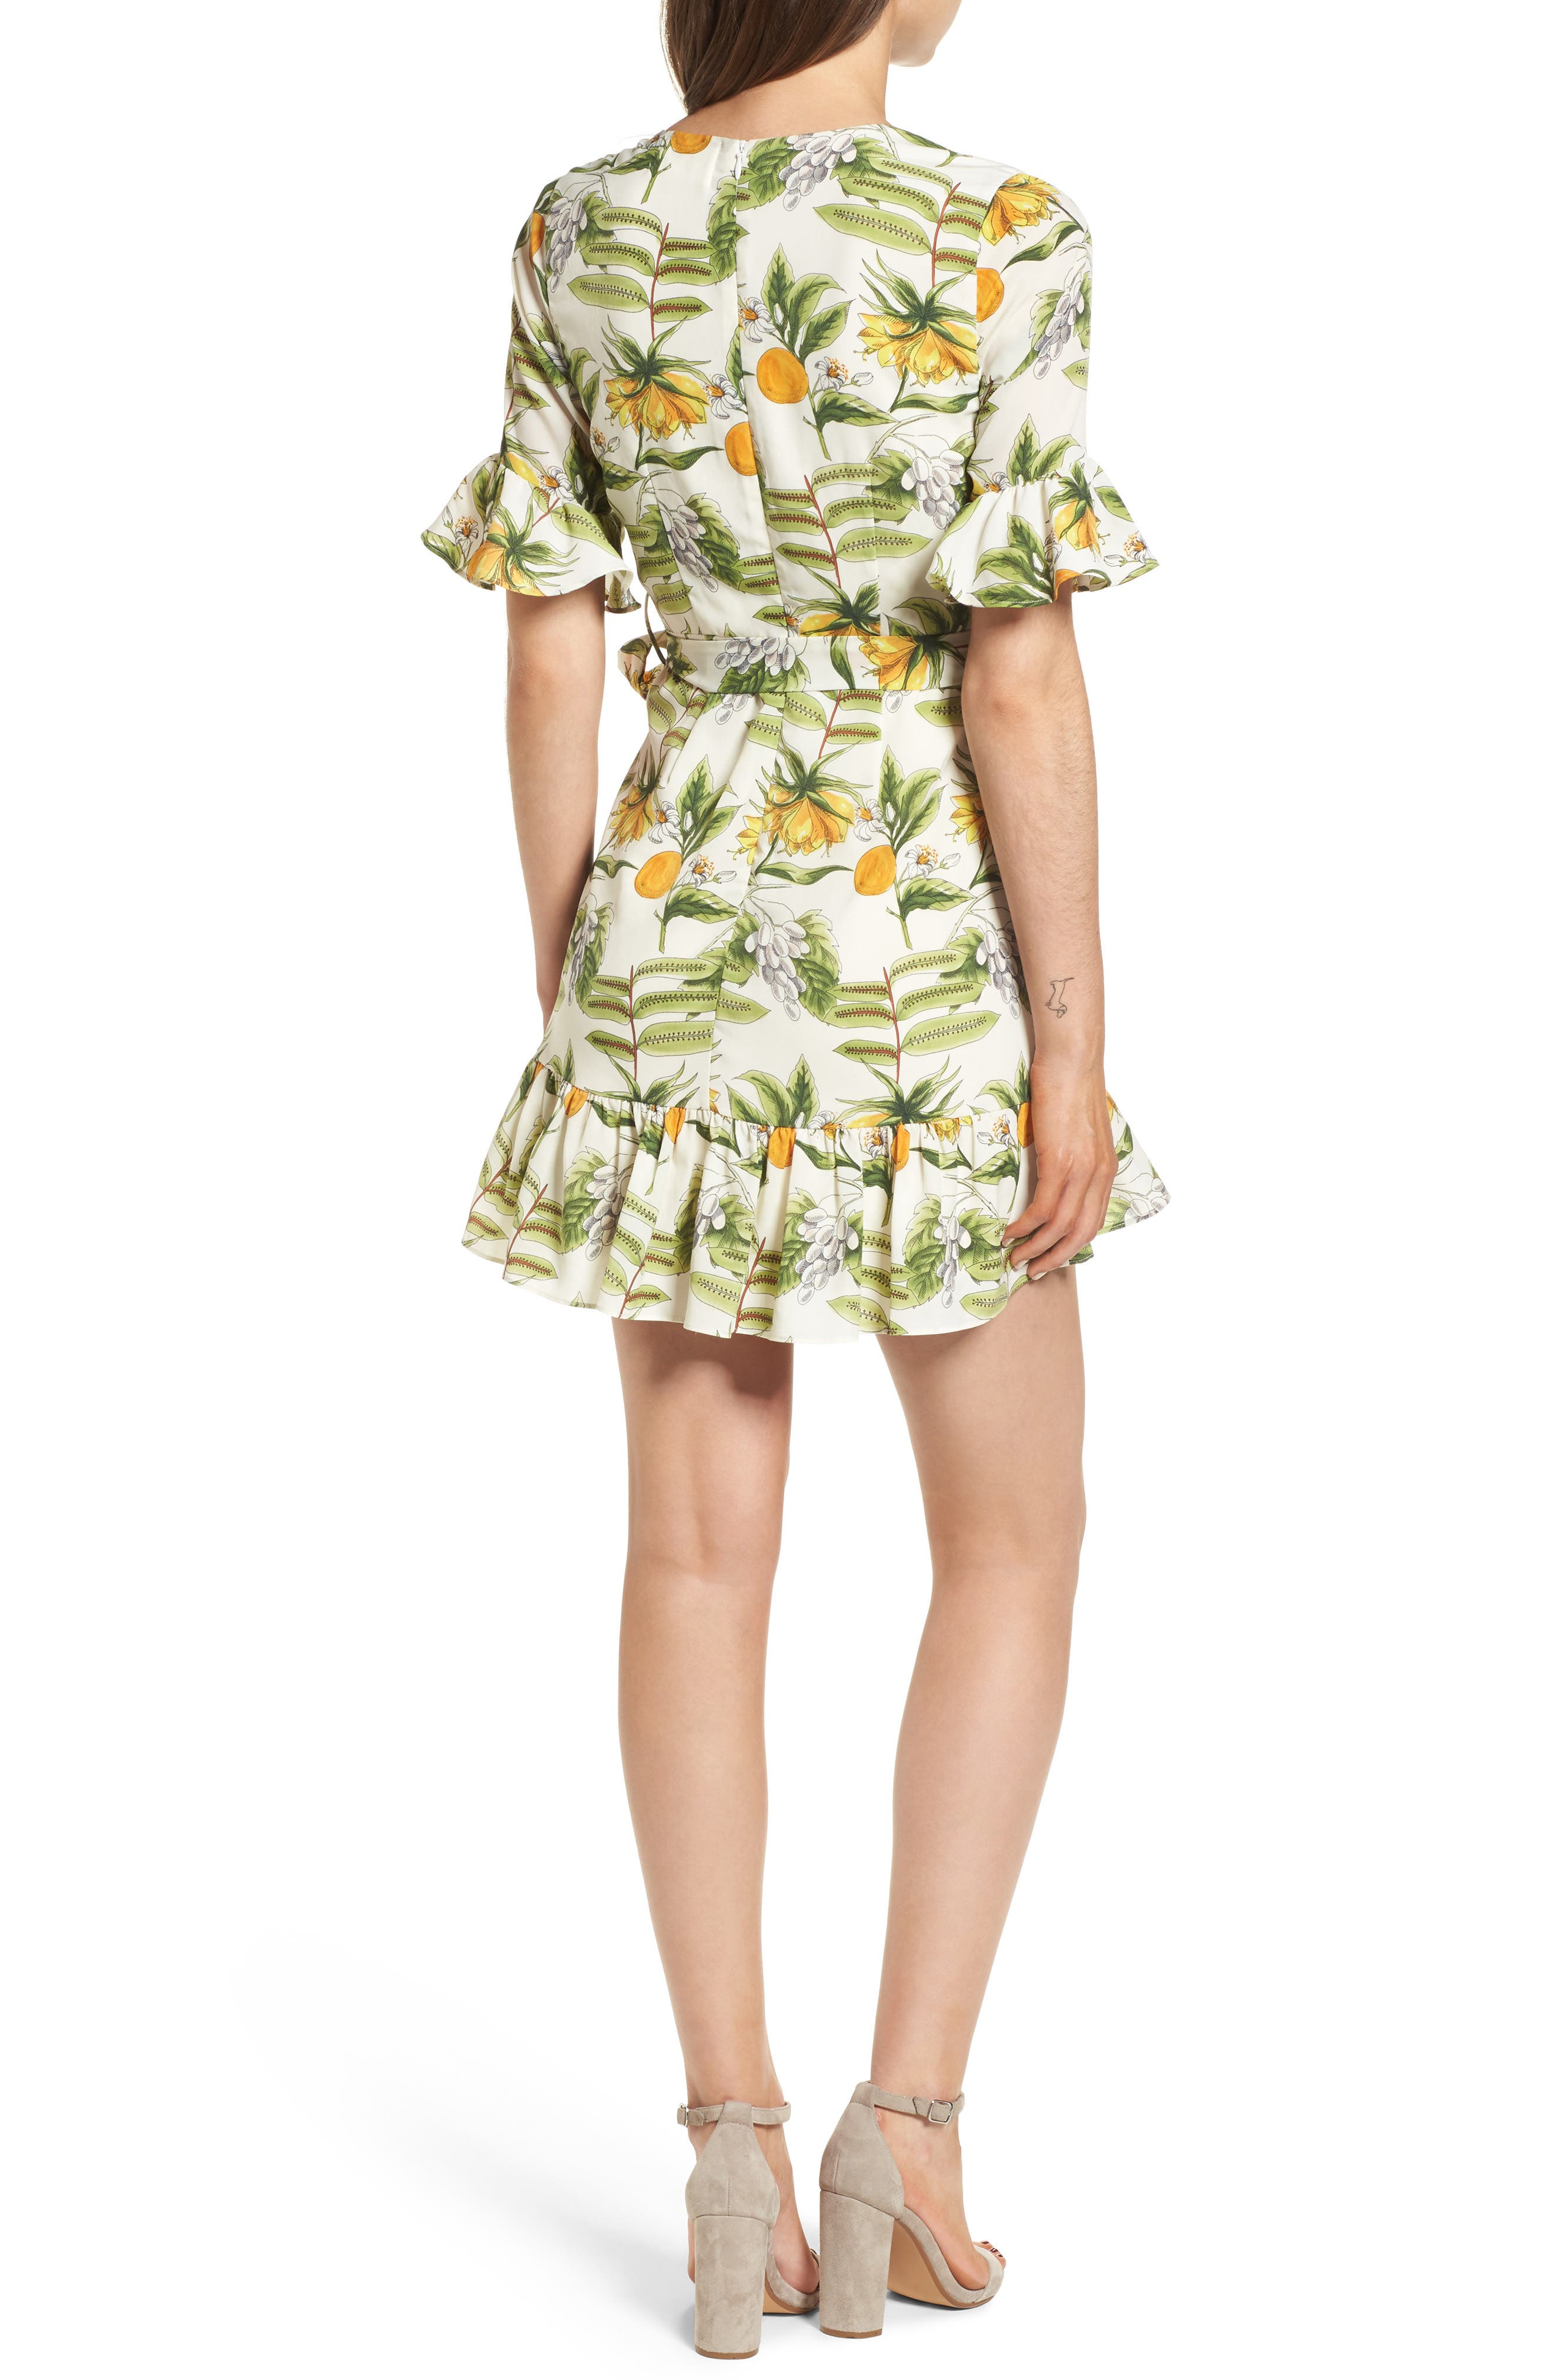 Limonada Citrus Dress,                             Alternate thumbnail 3, color,                             Ivory/ Yellow